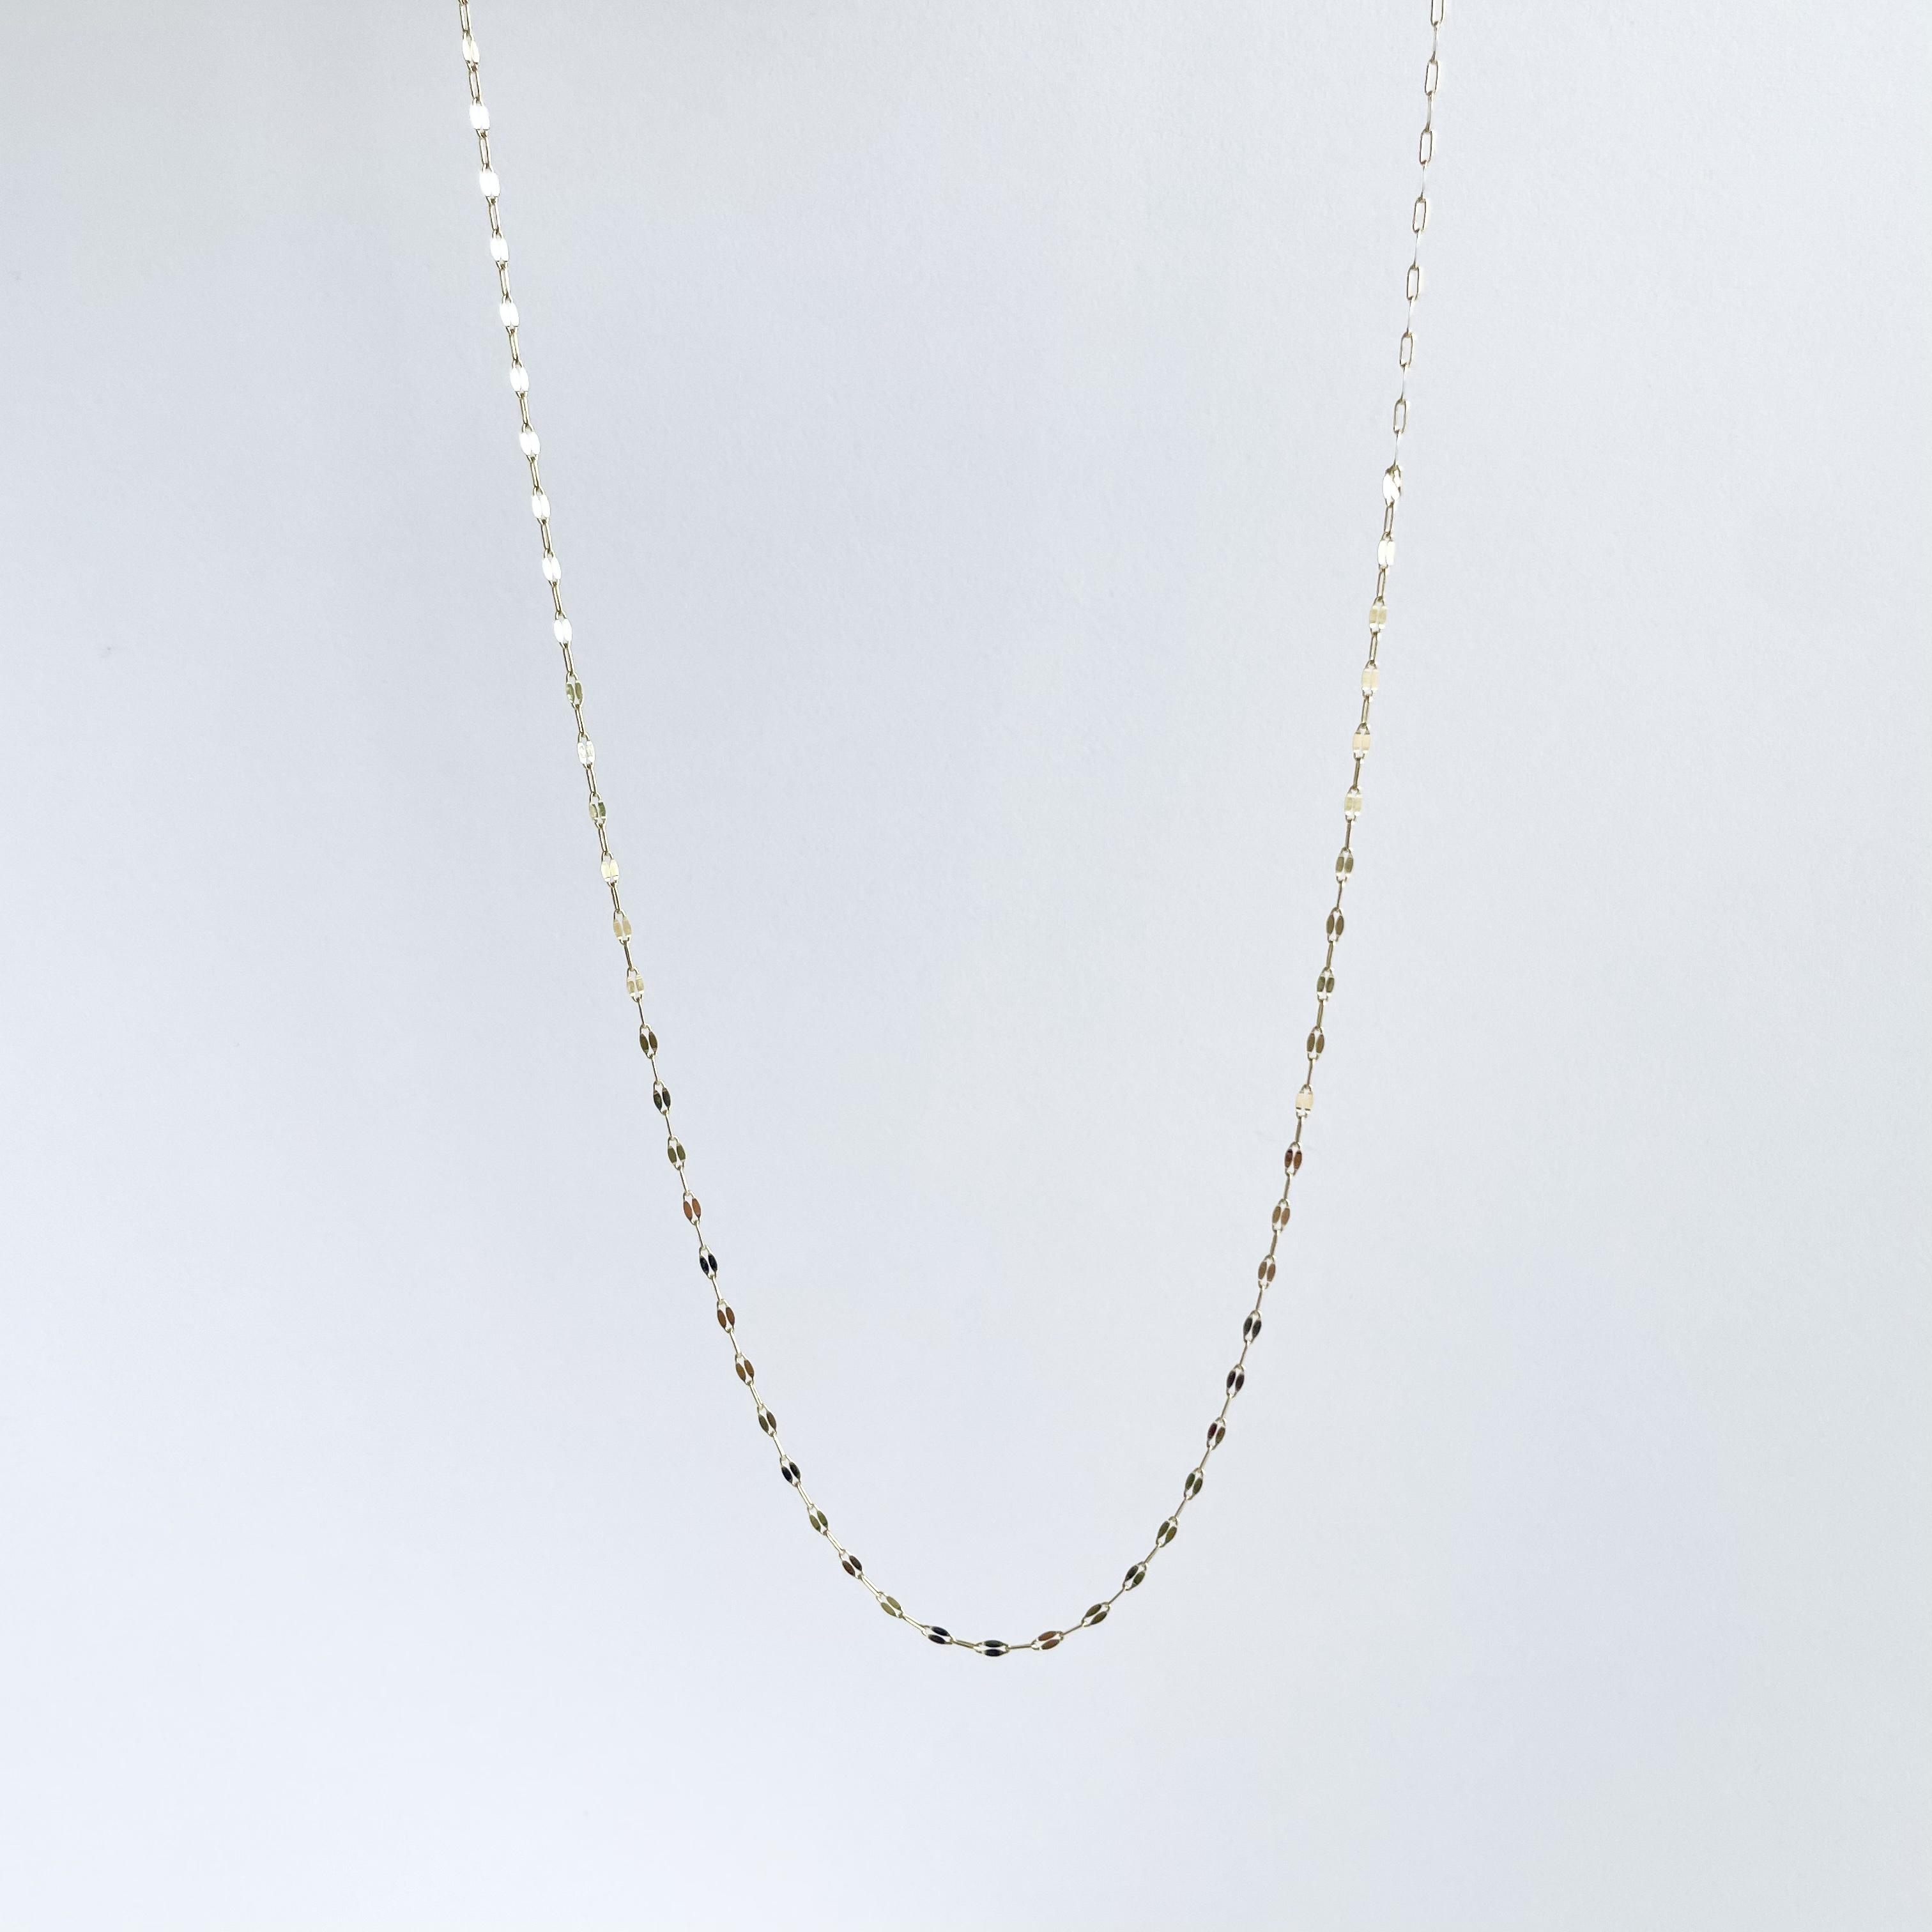 K10YG Design Chain Necklace / Shine